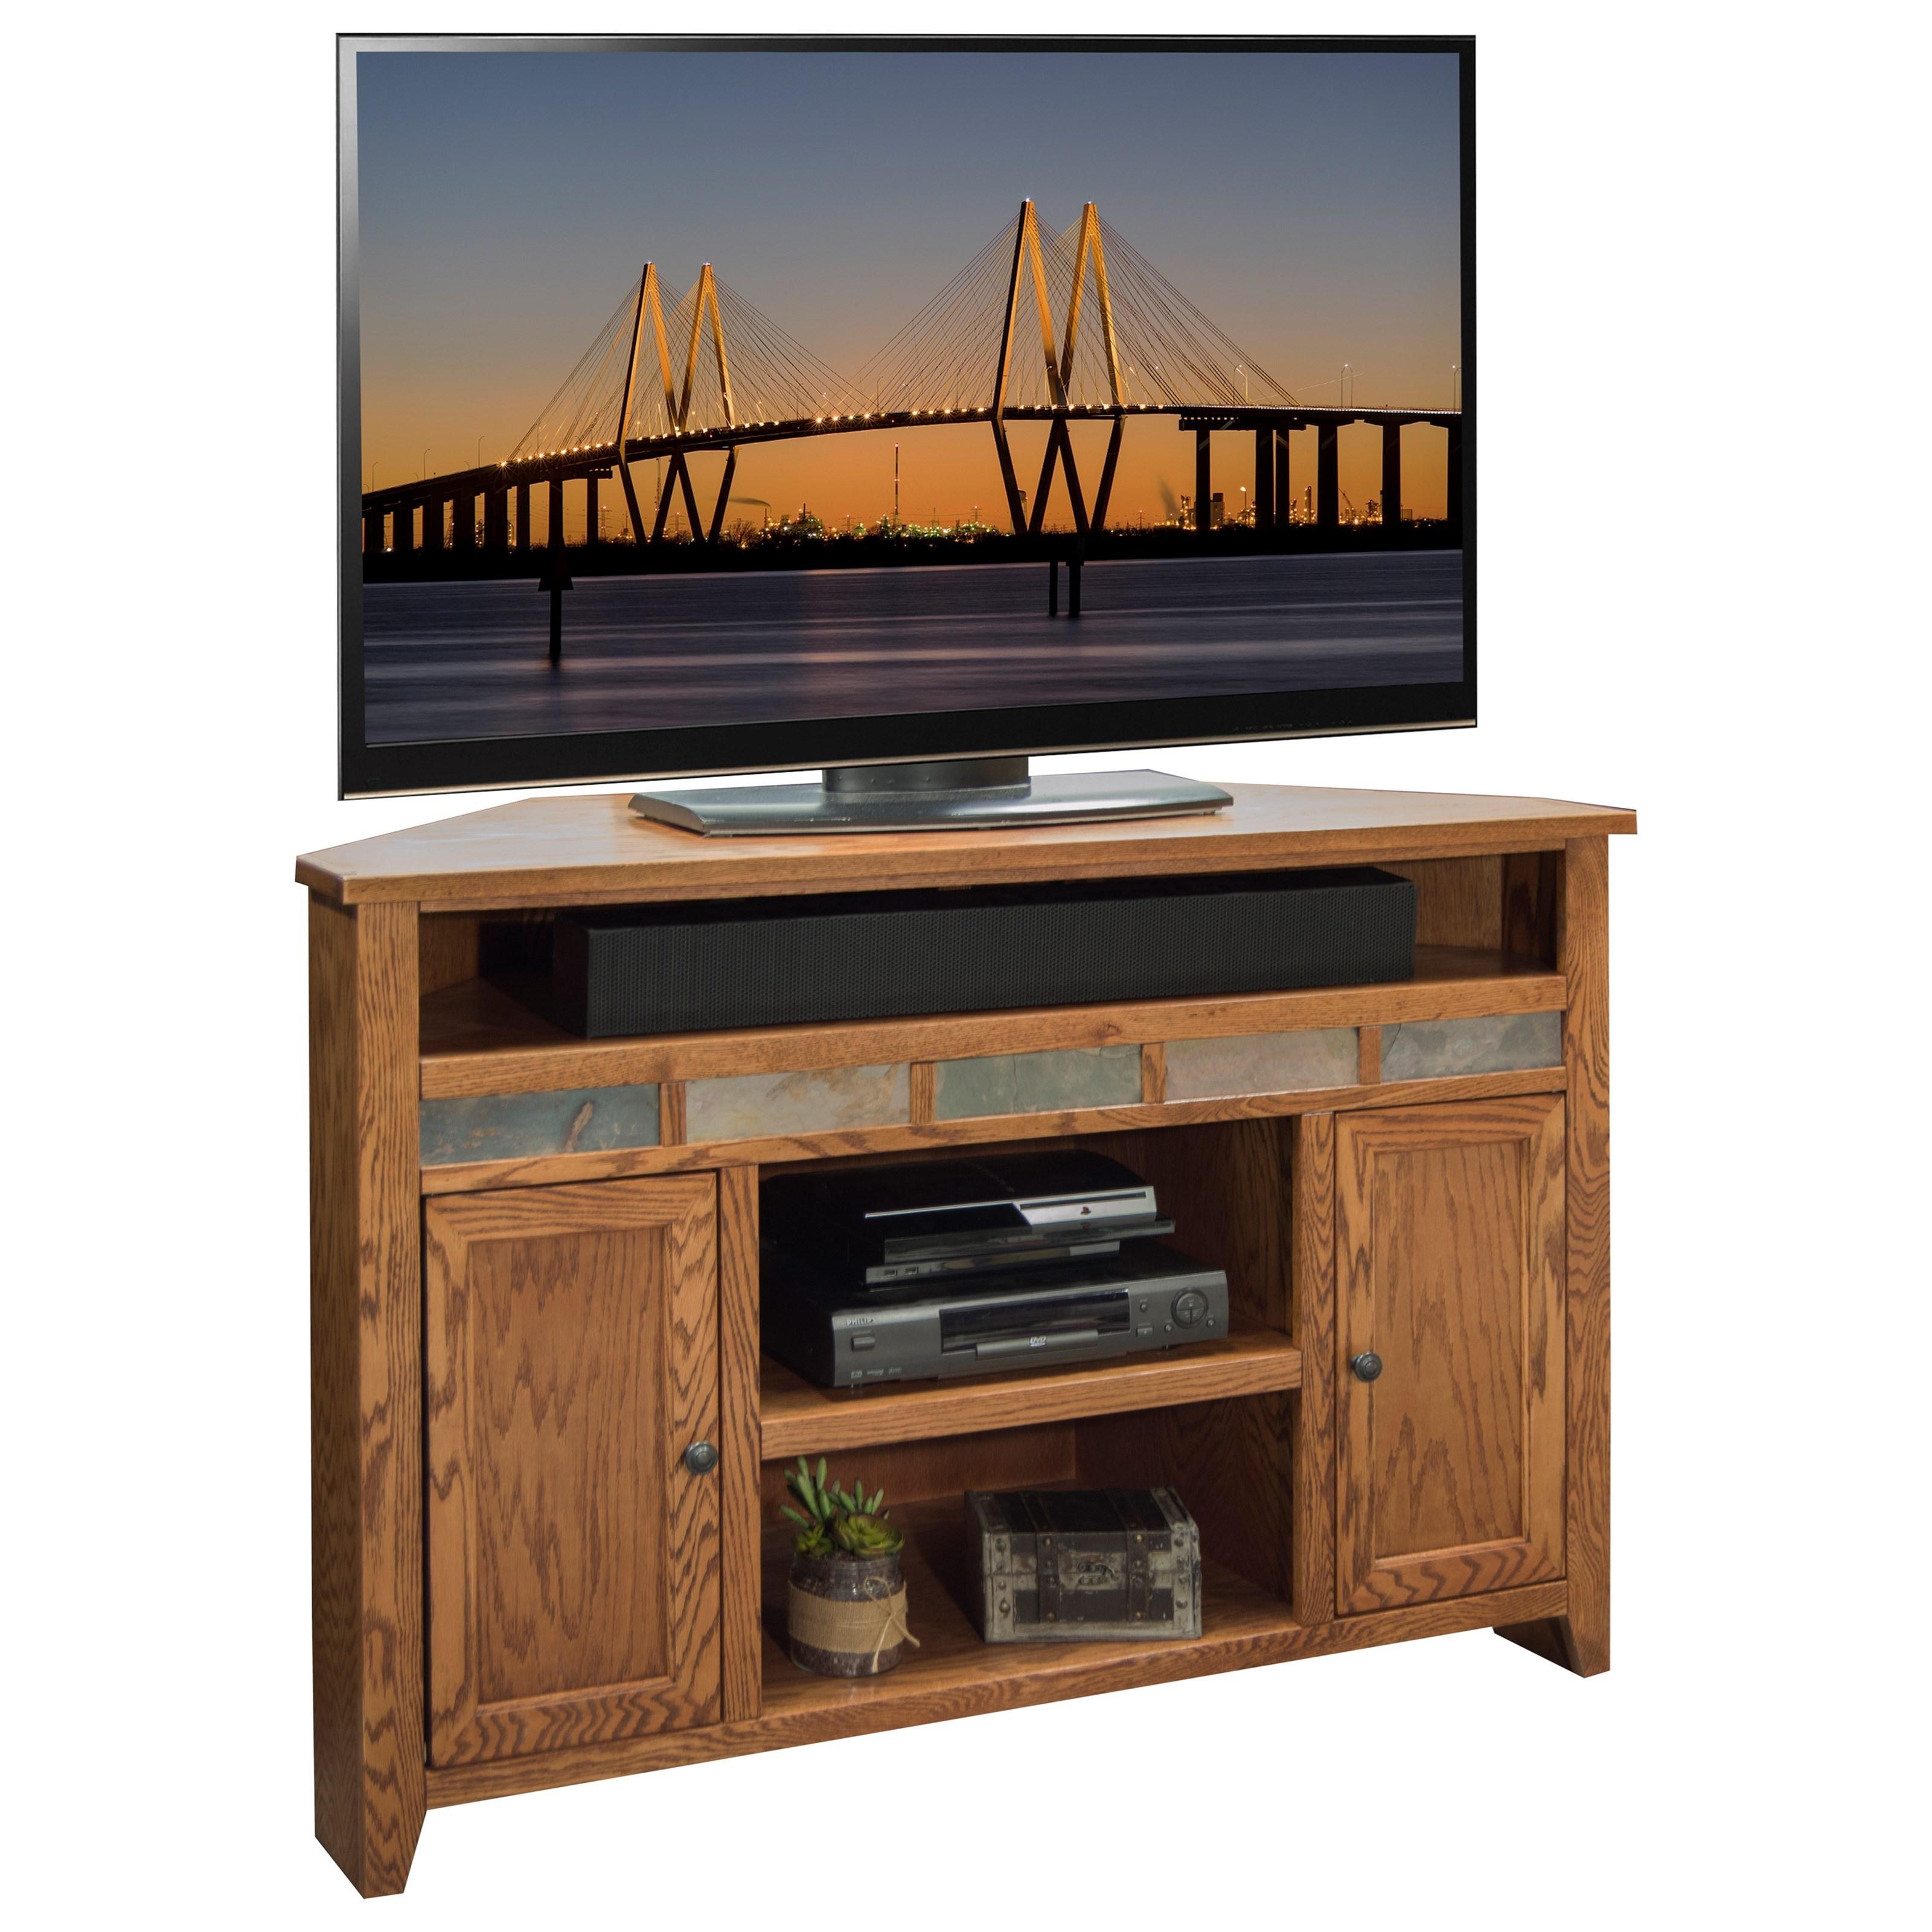 "Oak Creek 56"" Corner TV Cart by Legends Furniture at VanDrie Home Furnishings"